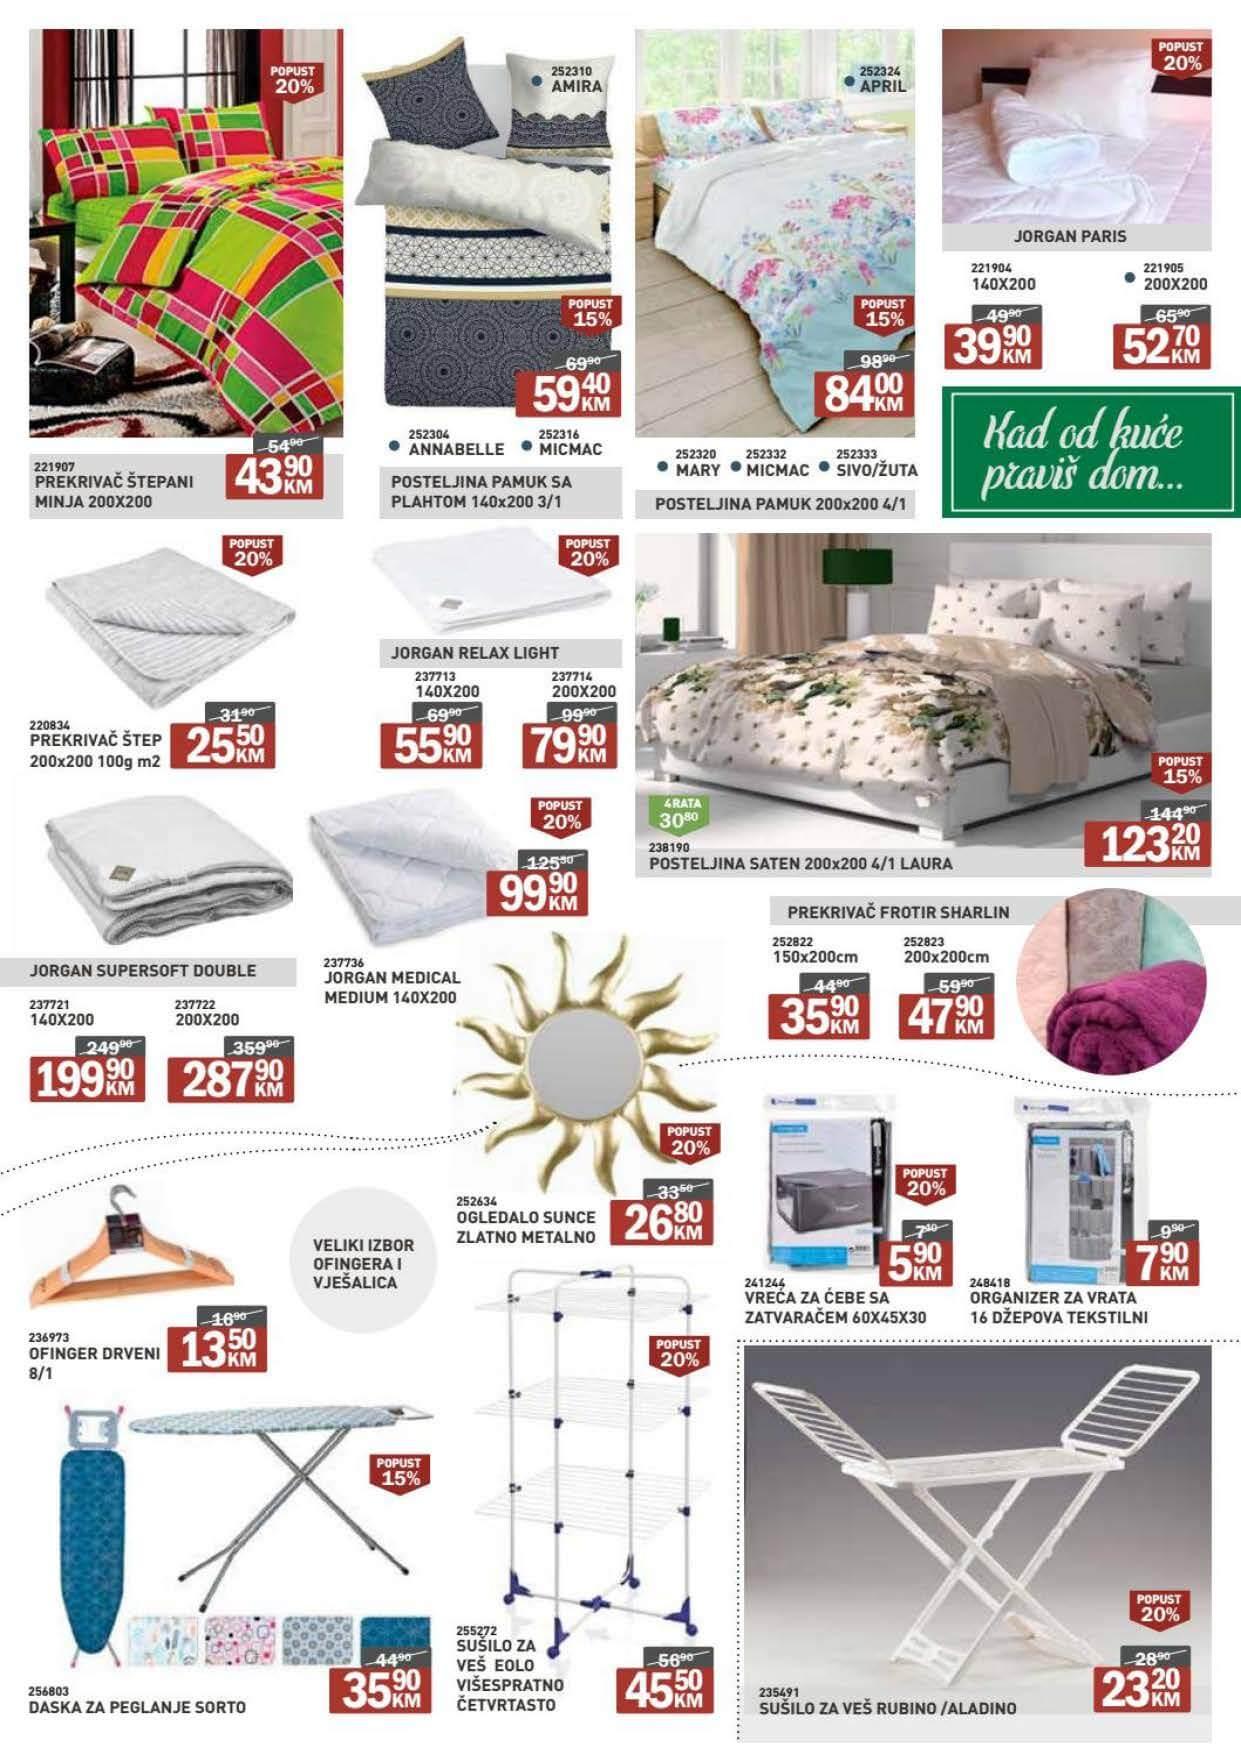 Verno Agromehanika Akcijski Katalog JUN 2021 eKatalozi.com PR Page 20